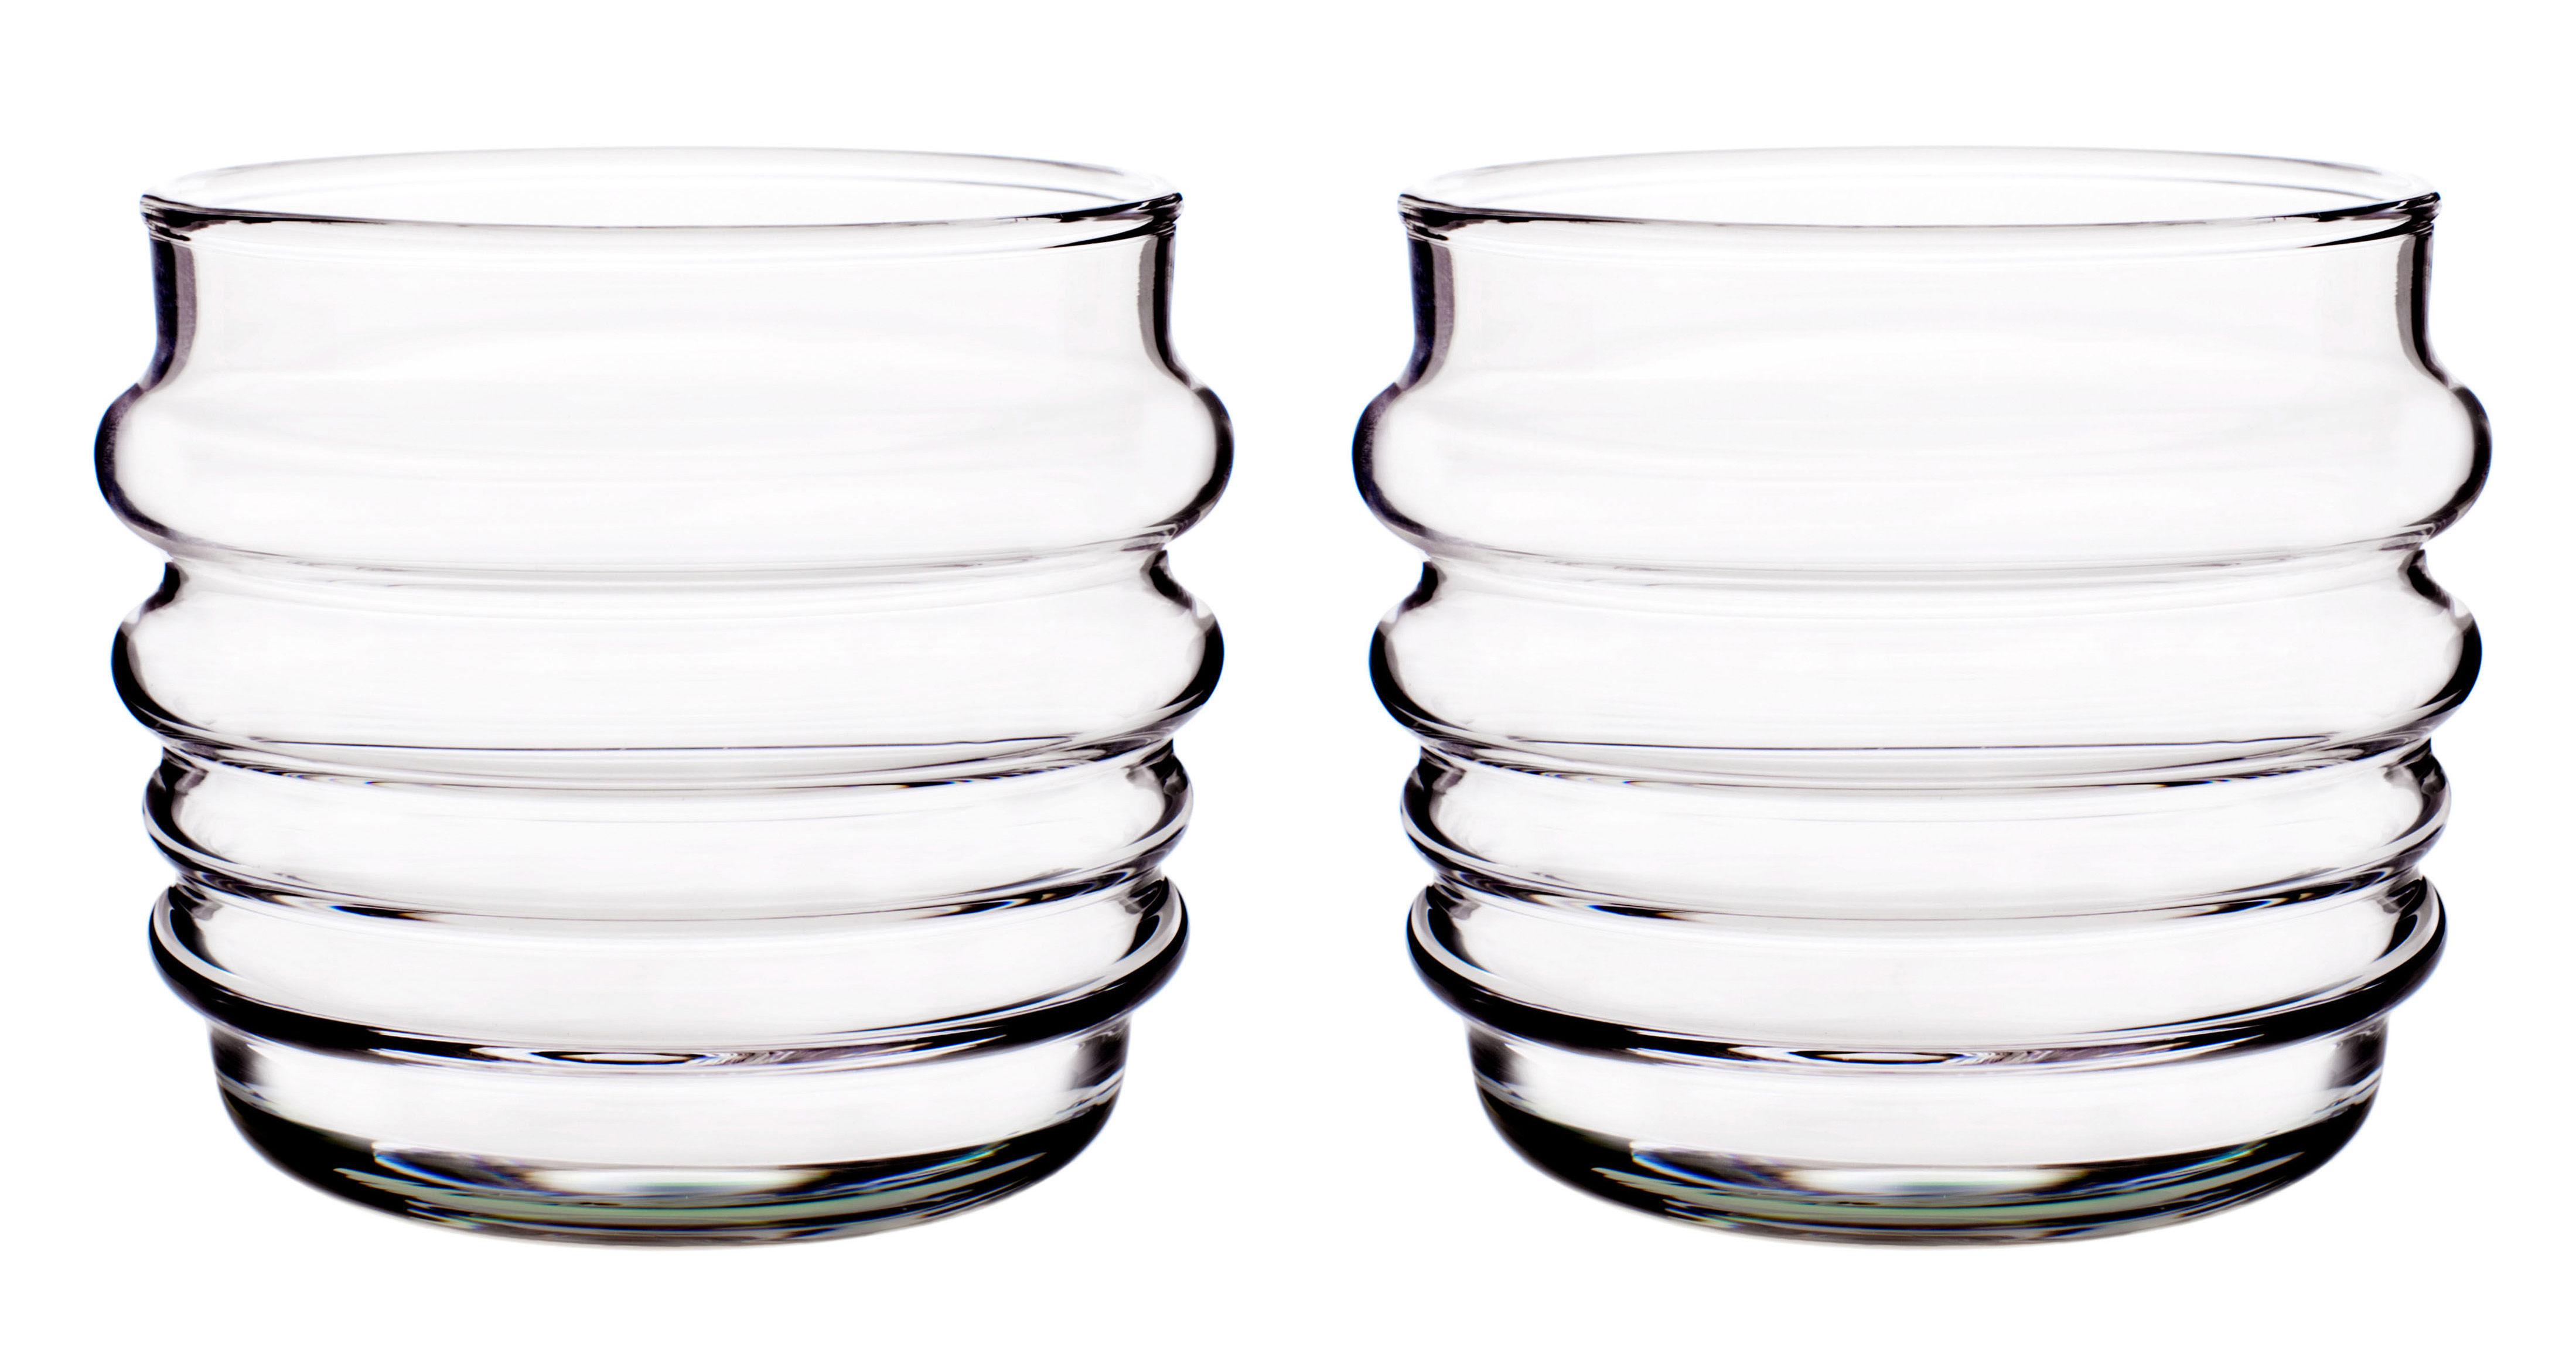 Tischkultur - Gläser - Sukat Makkaralla Becher / 2er-Set - Marimekko - Sukat Makkaralla - Transparent - mundgeblasenes Glas